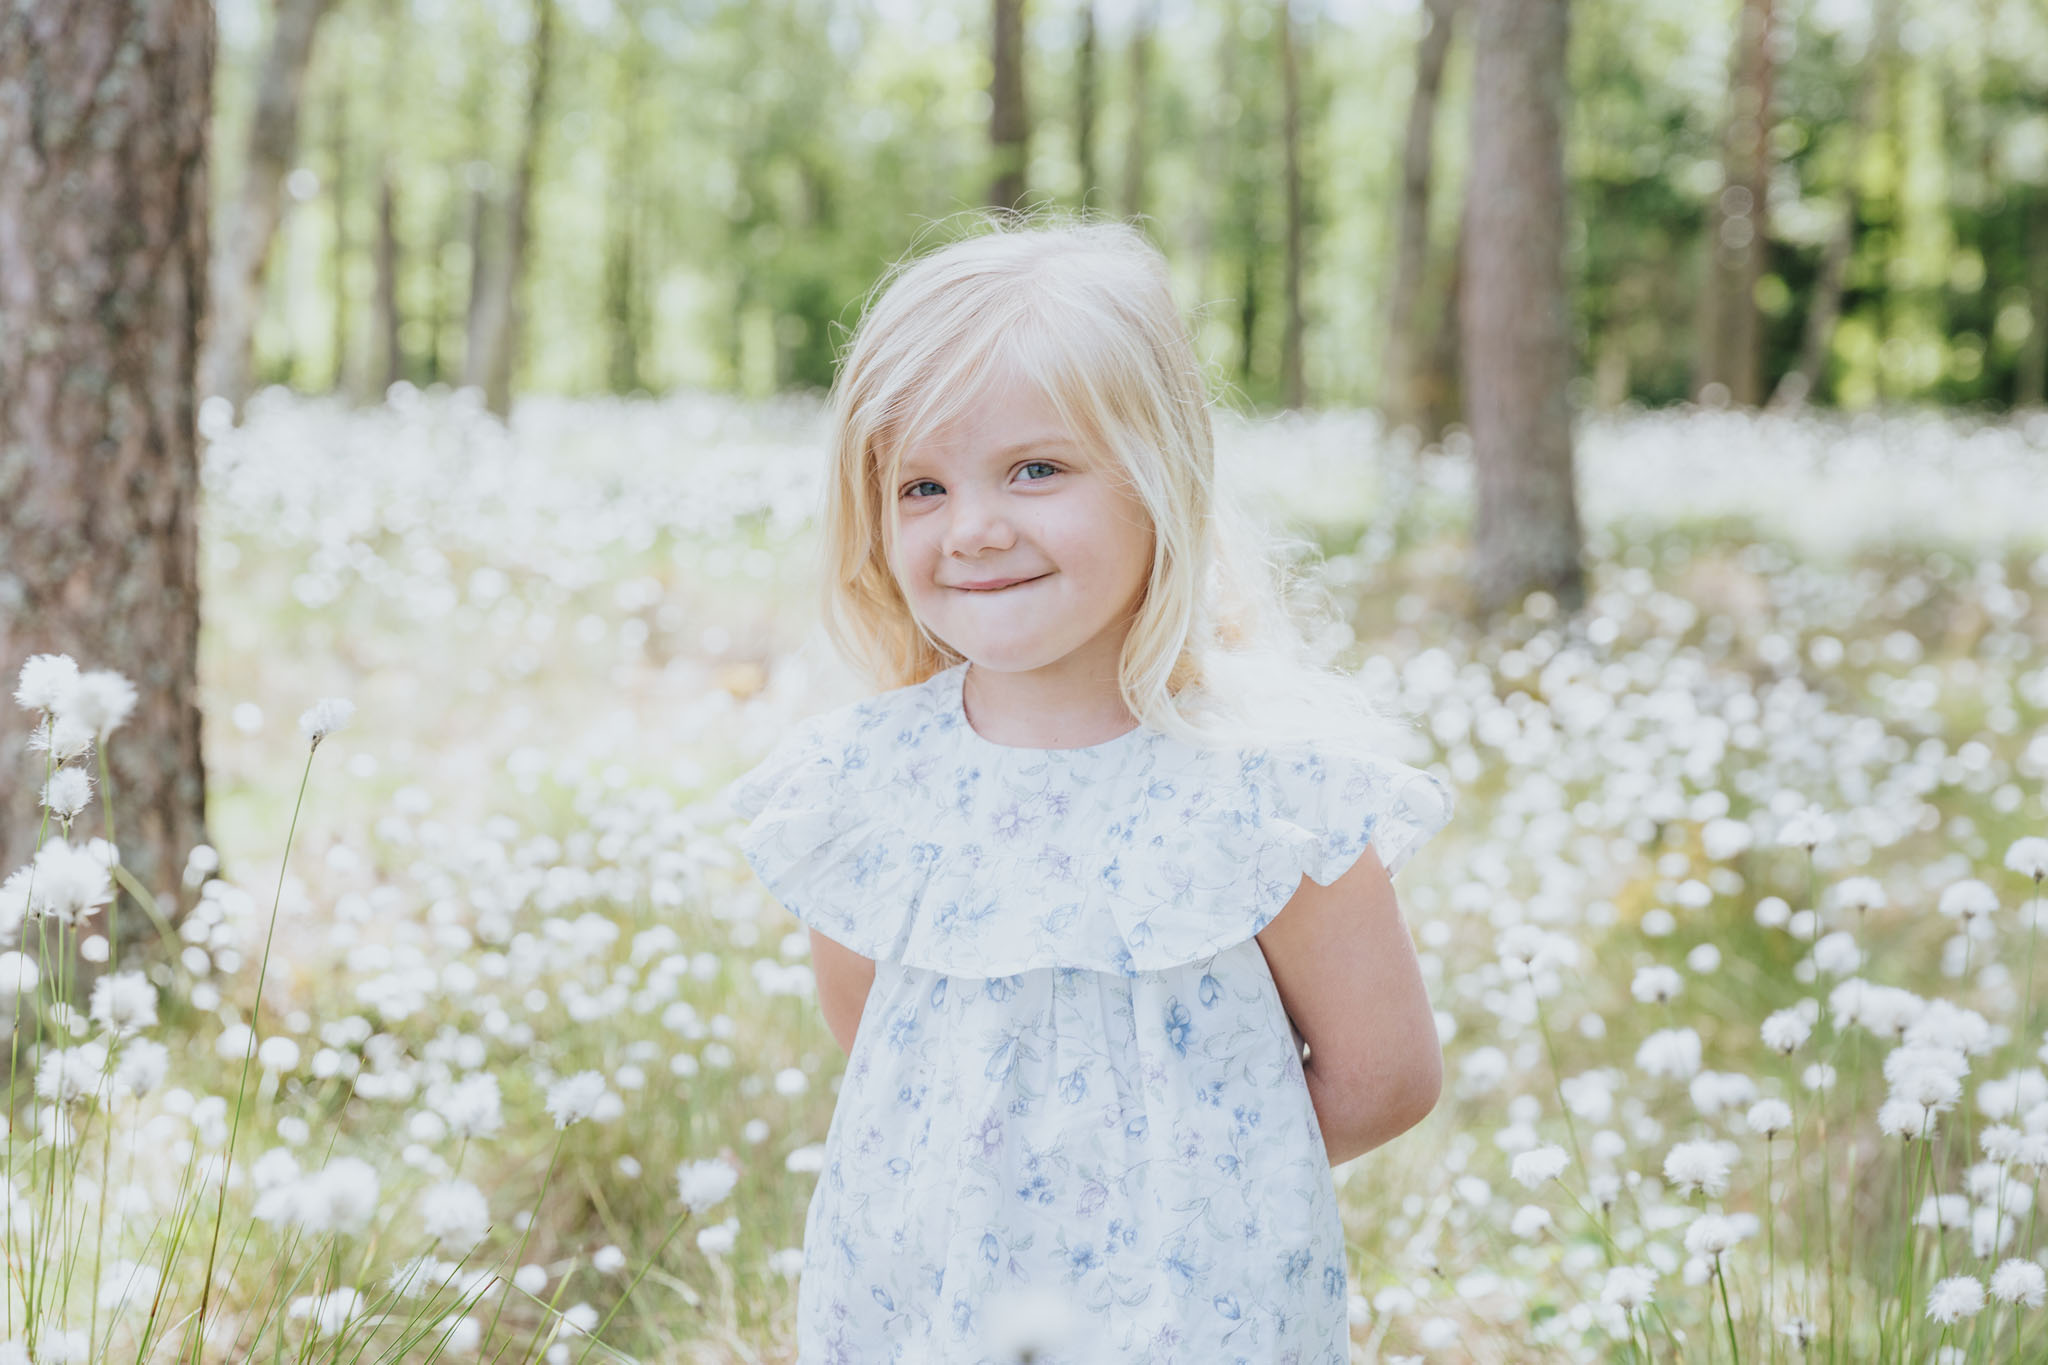 2018 05 20  Familjefotografering Almarsson, Fotograf Emy, 65.jpg